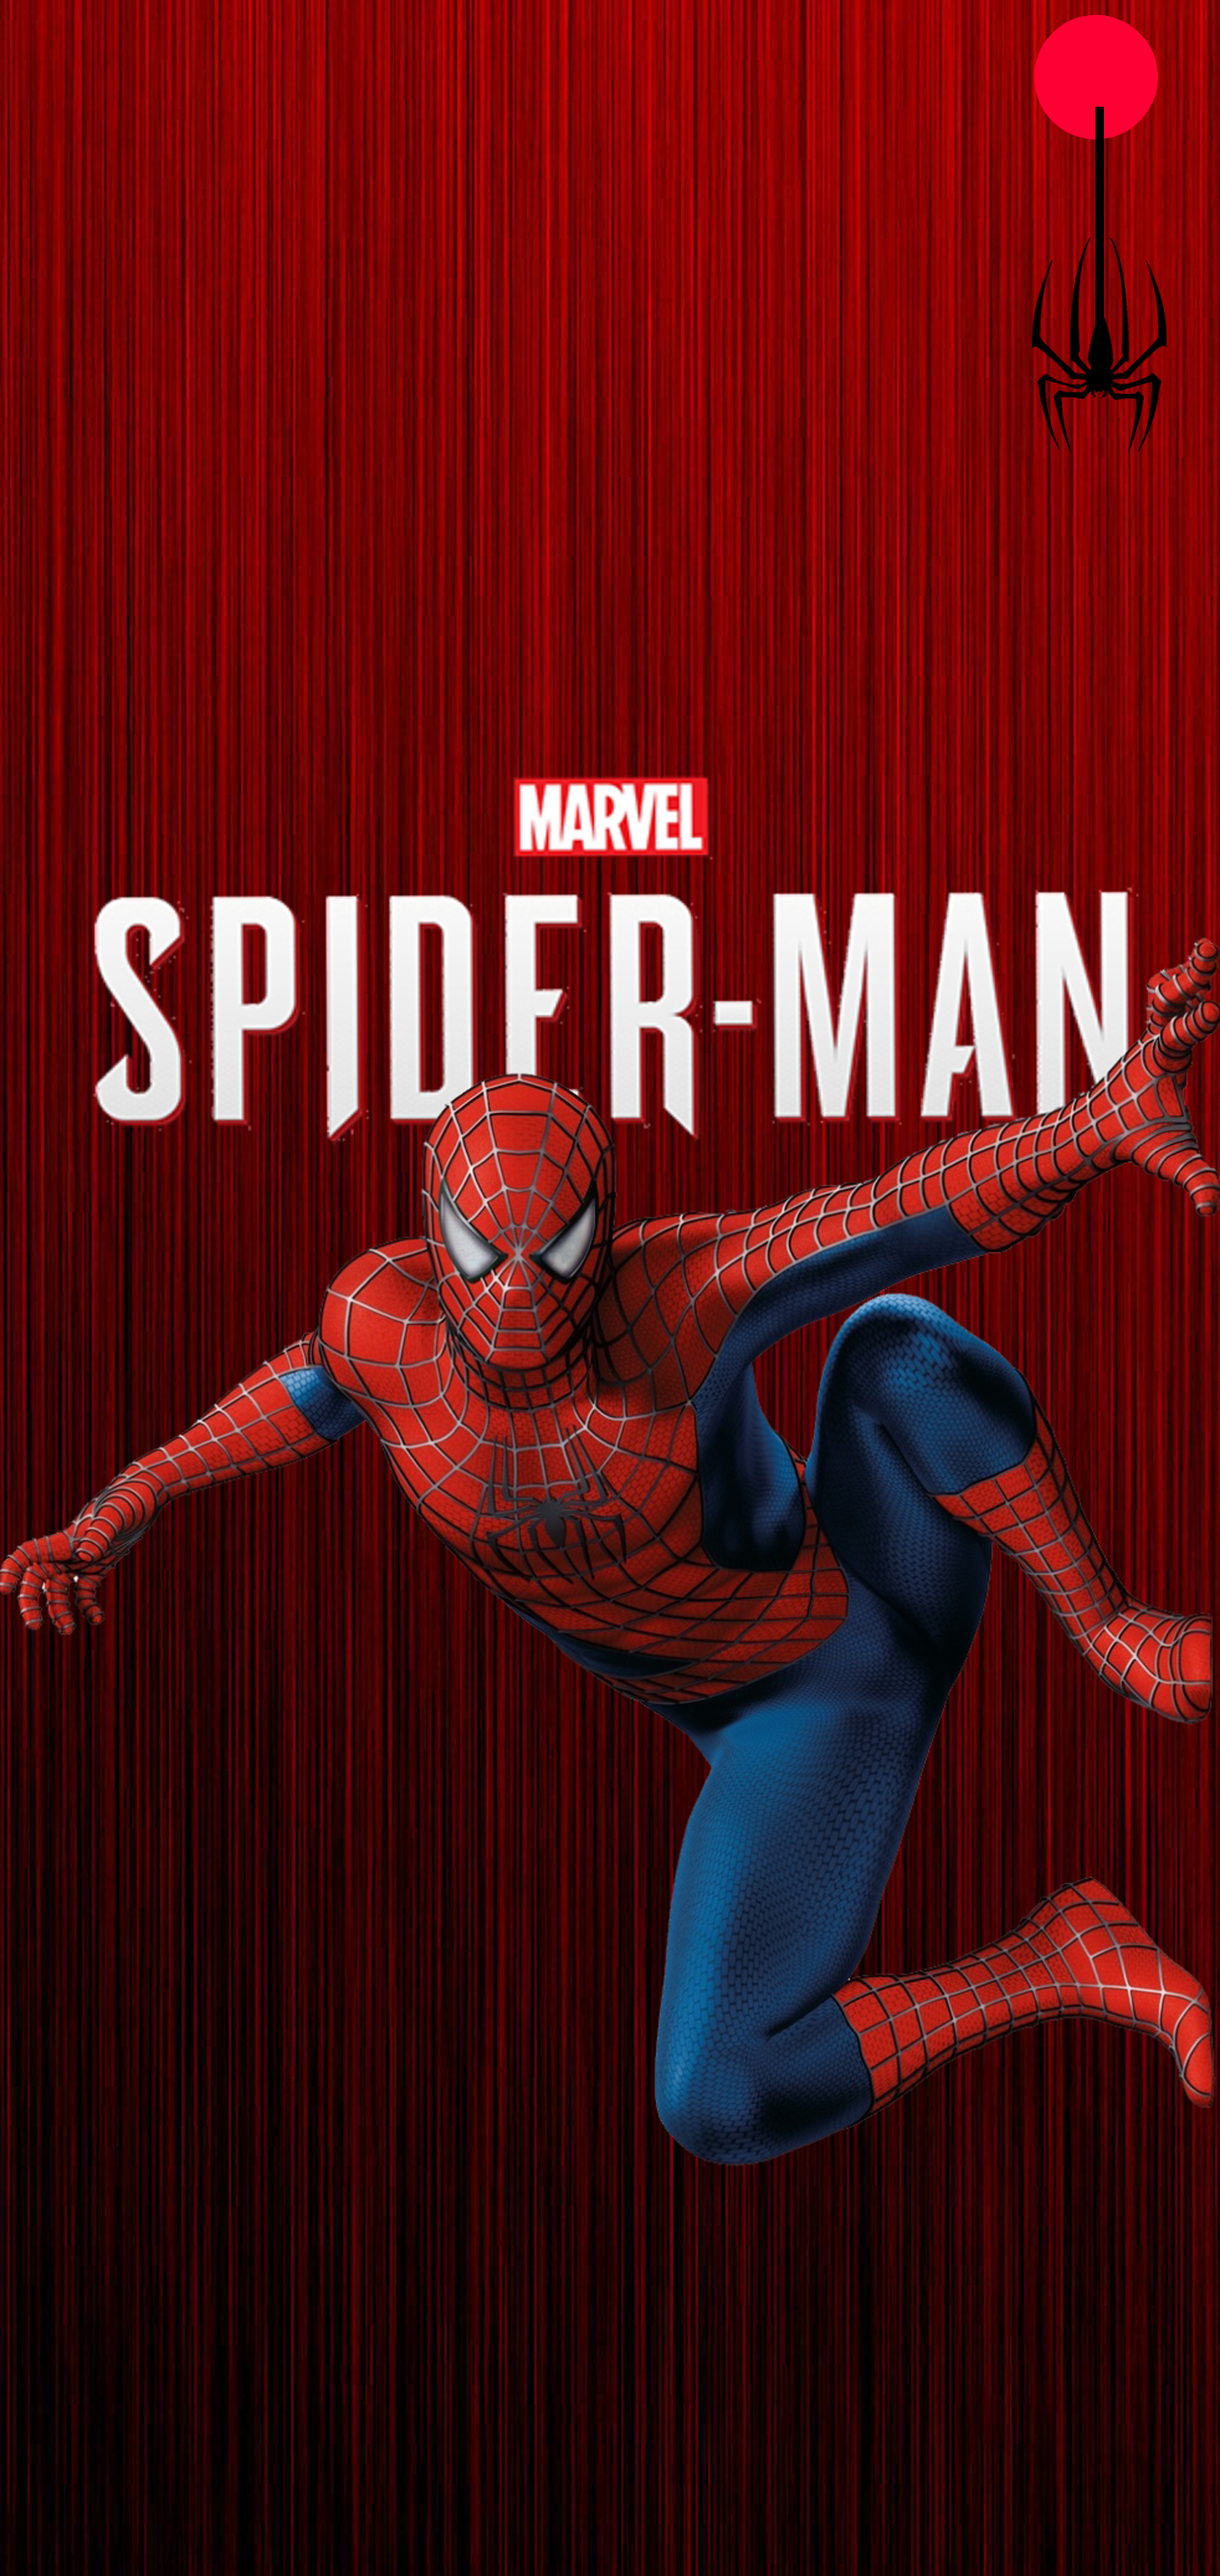 S10 Hole Punch Wallpaper Spider Man 1440x3040 Wallpaper Teahub Io